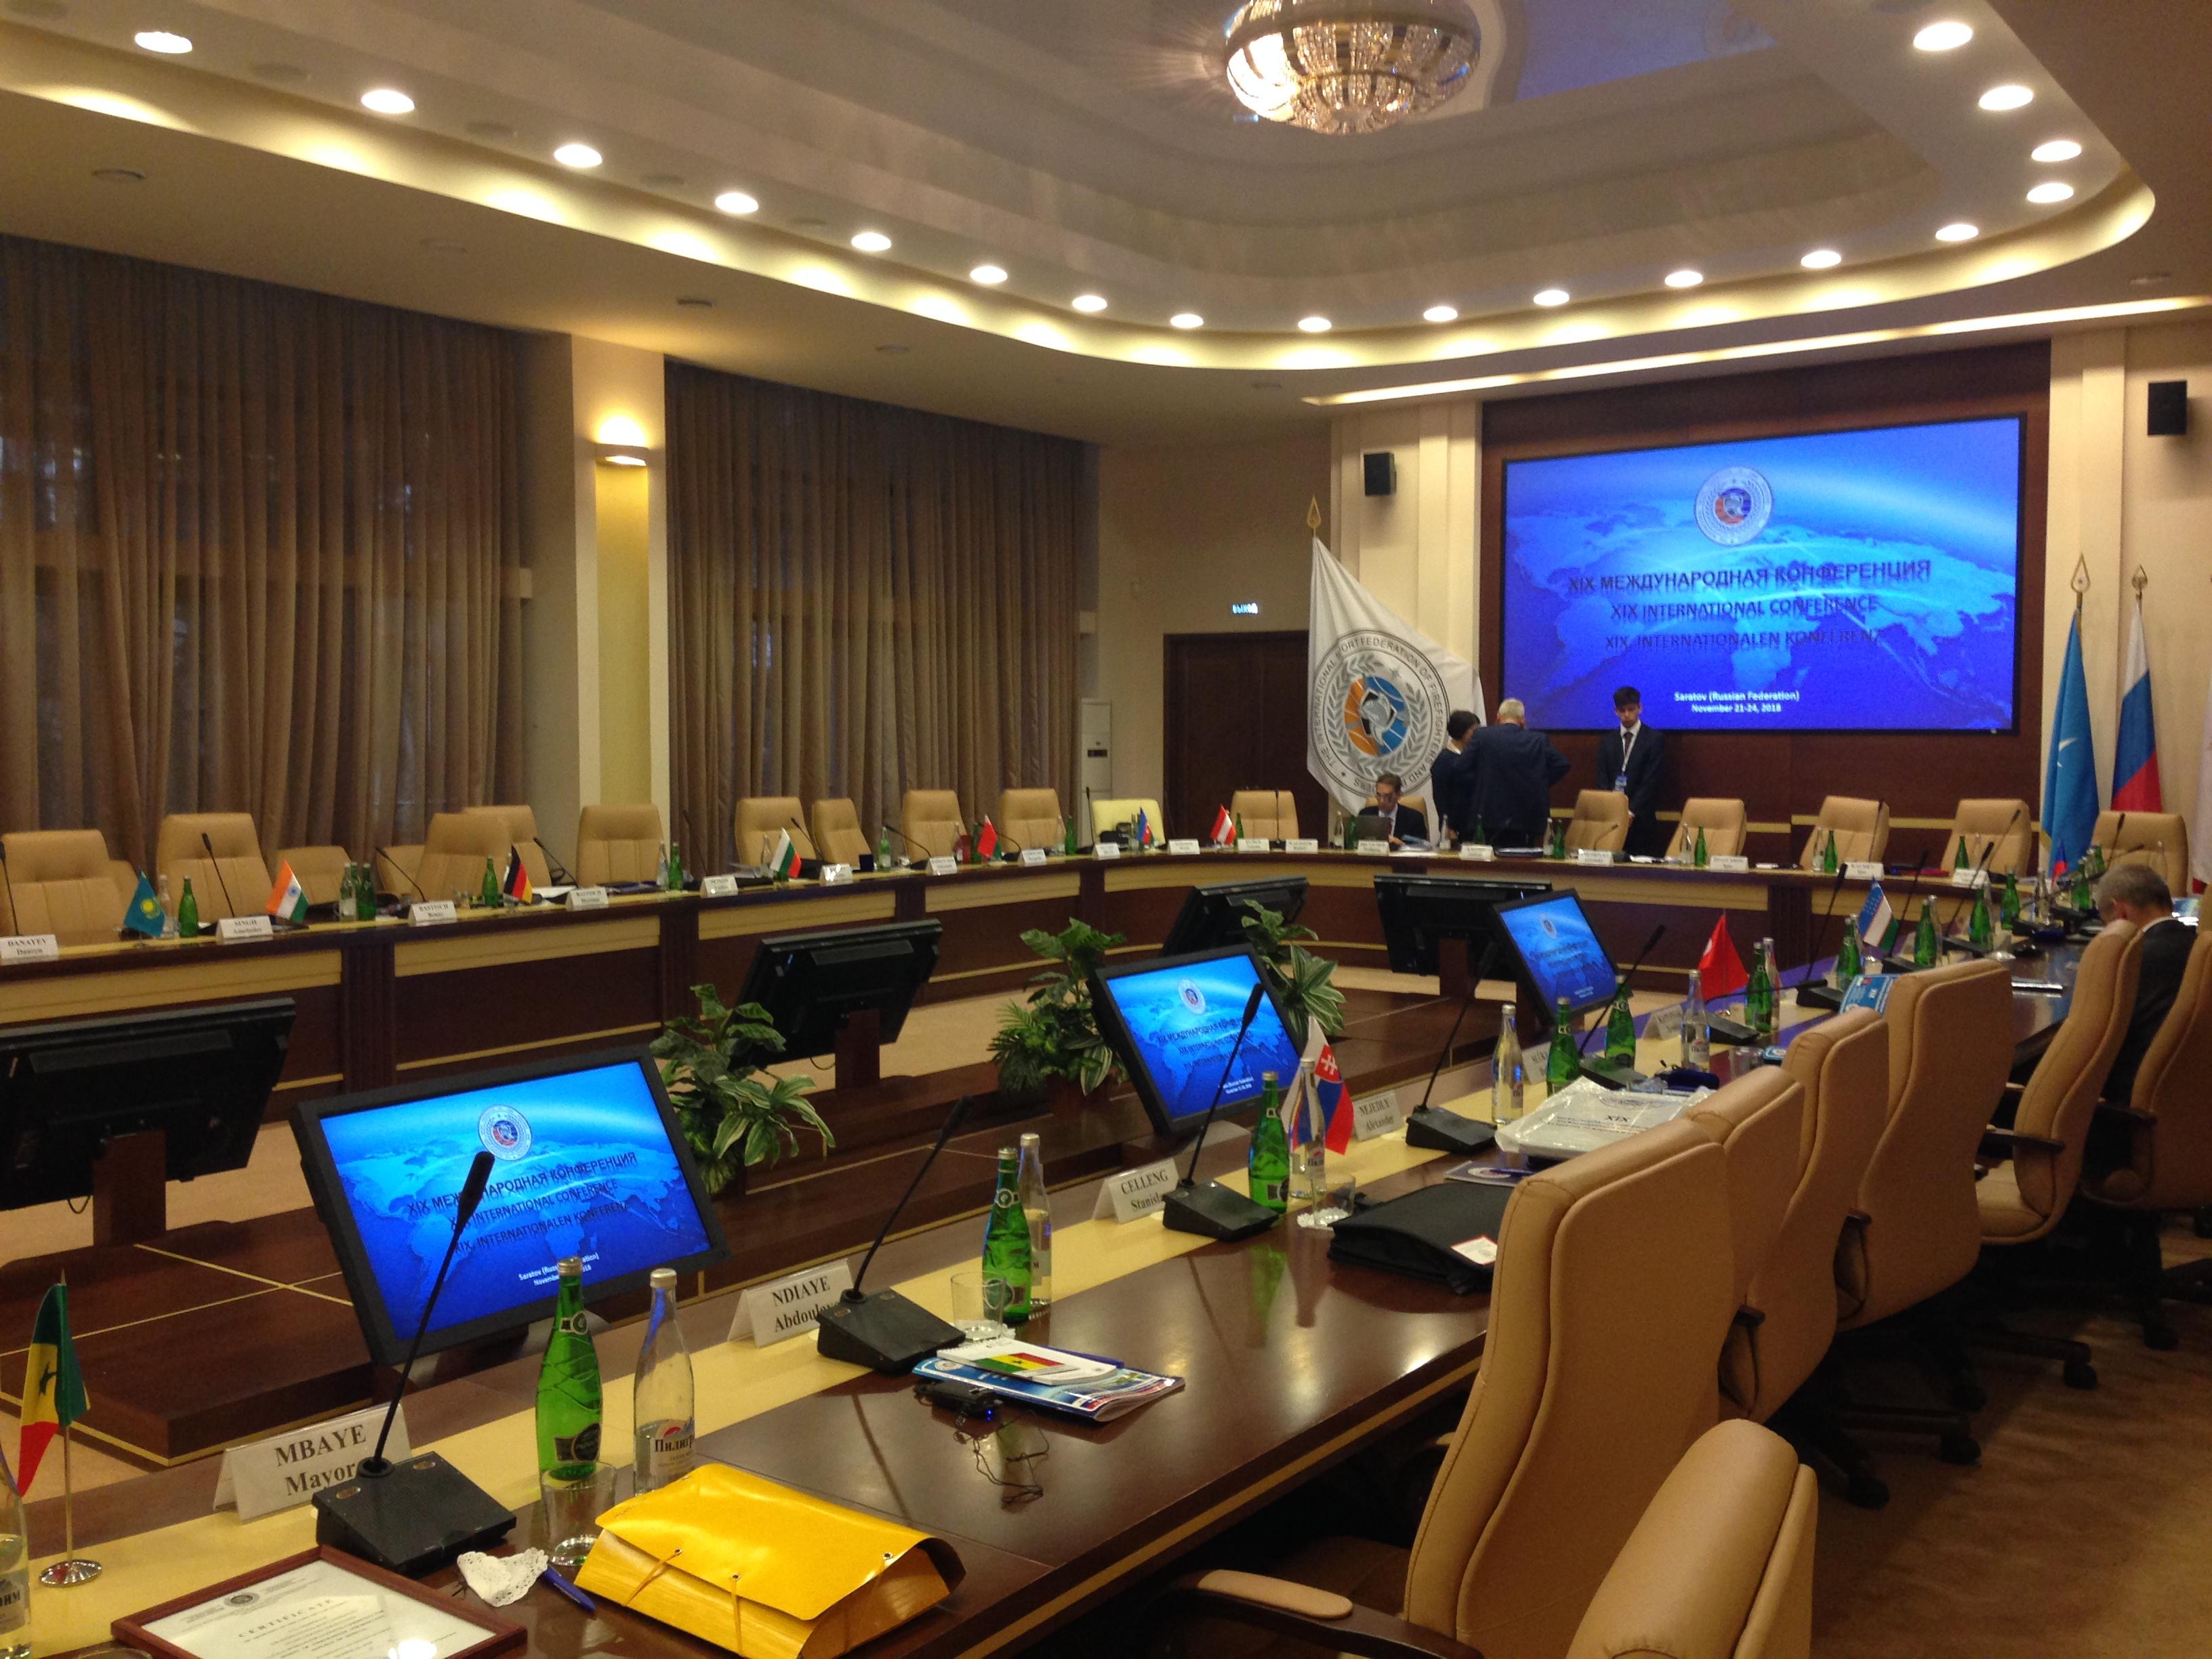 Simultaneous interpreting during negotiations